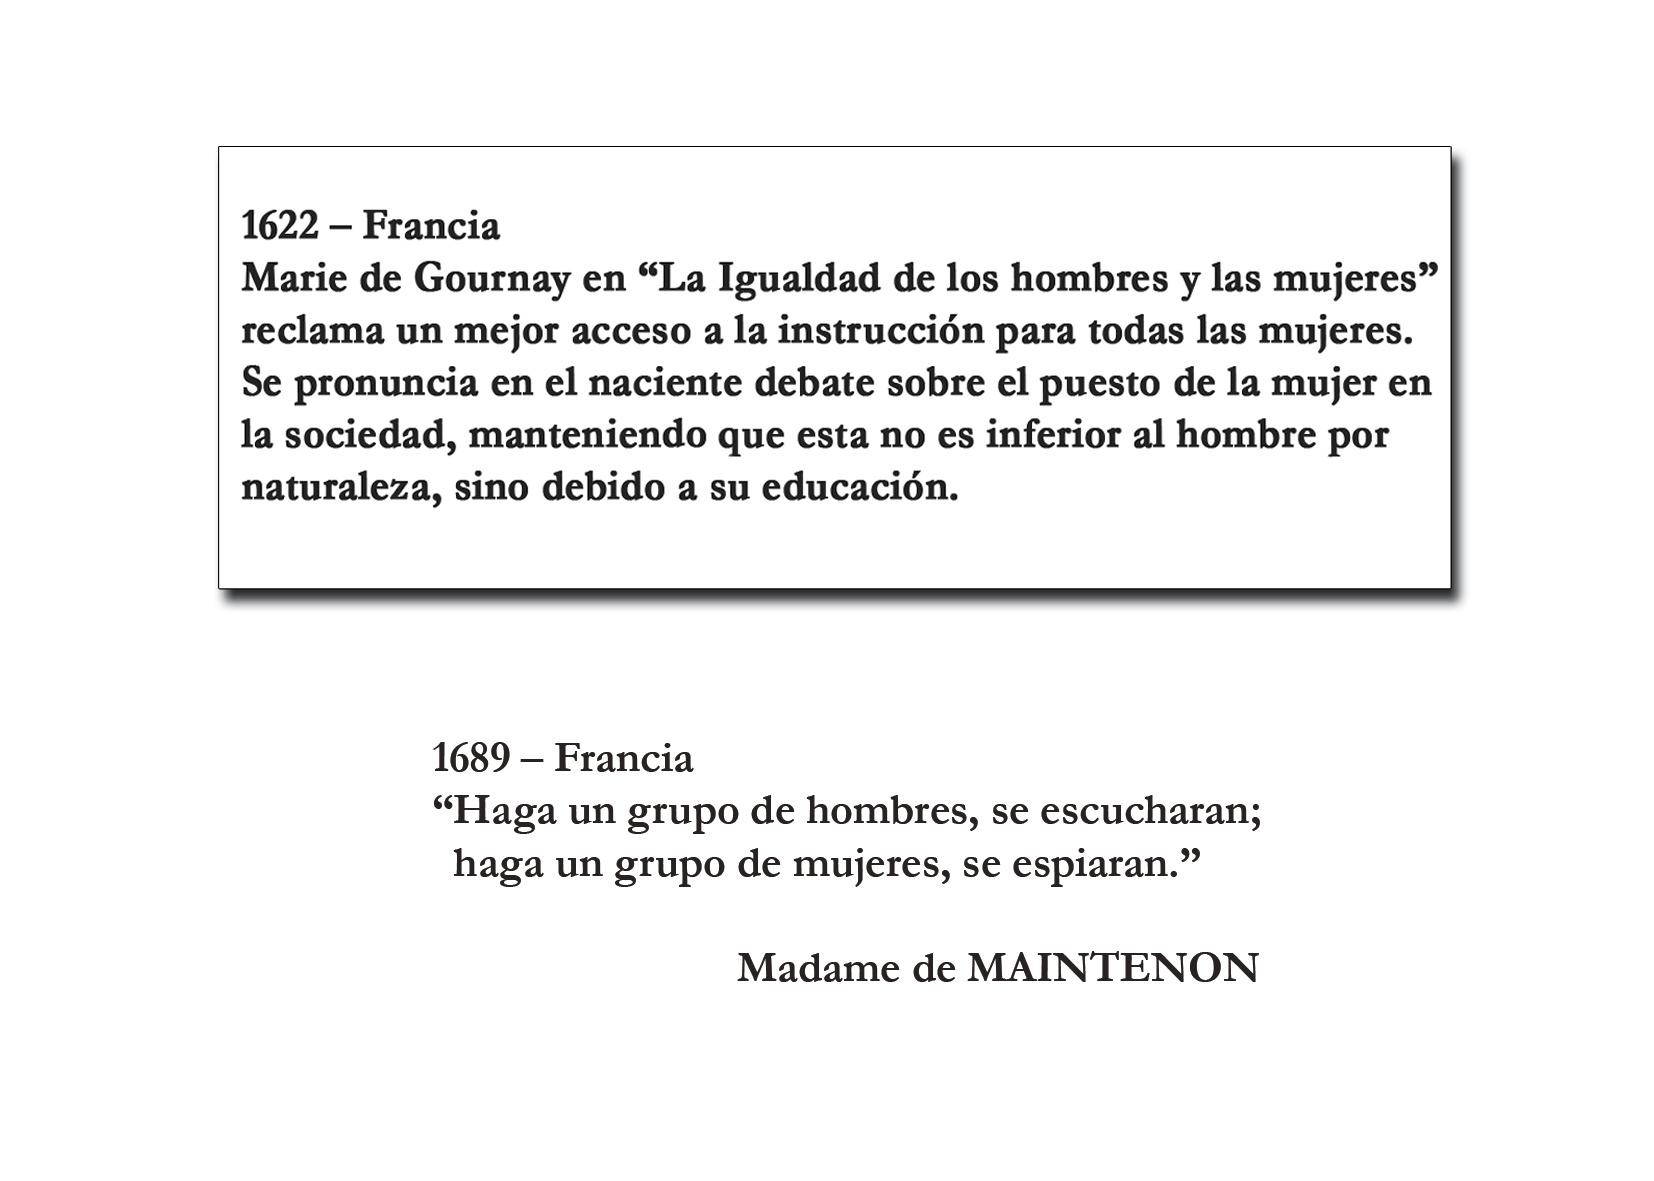 MhN - 11 POSTAL - Mme de MAINTENON